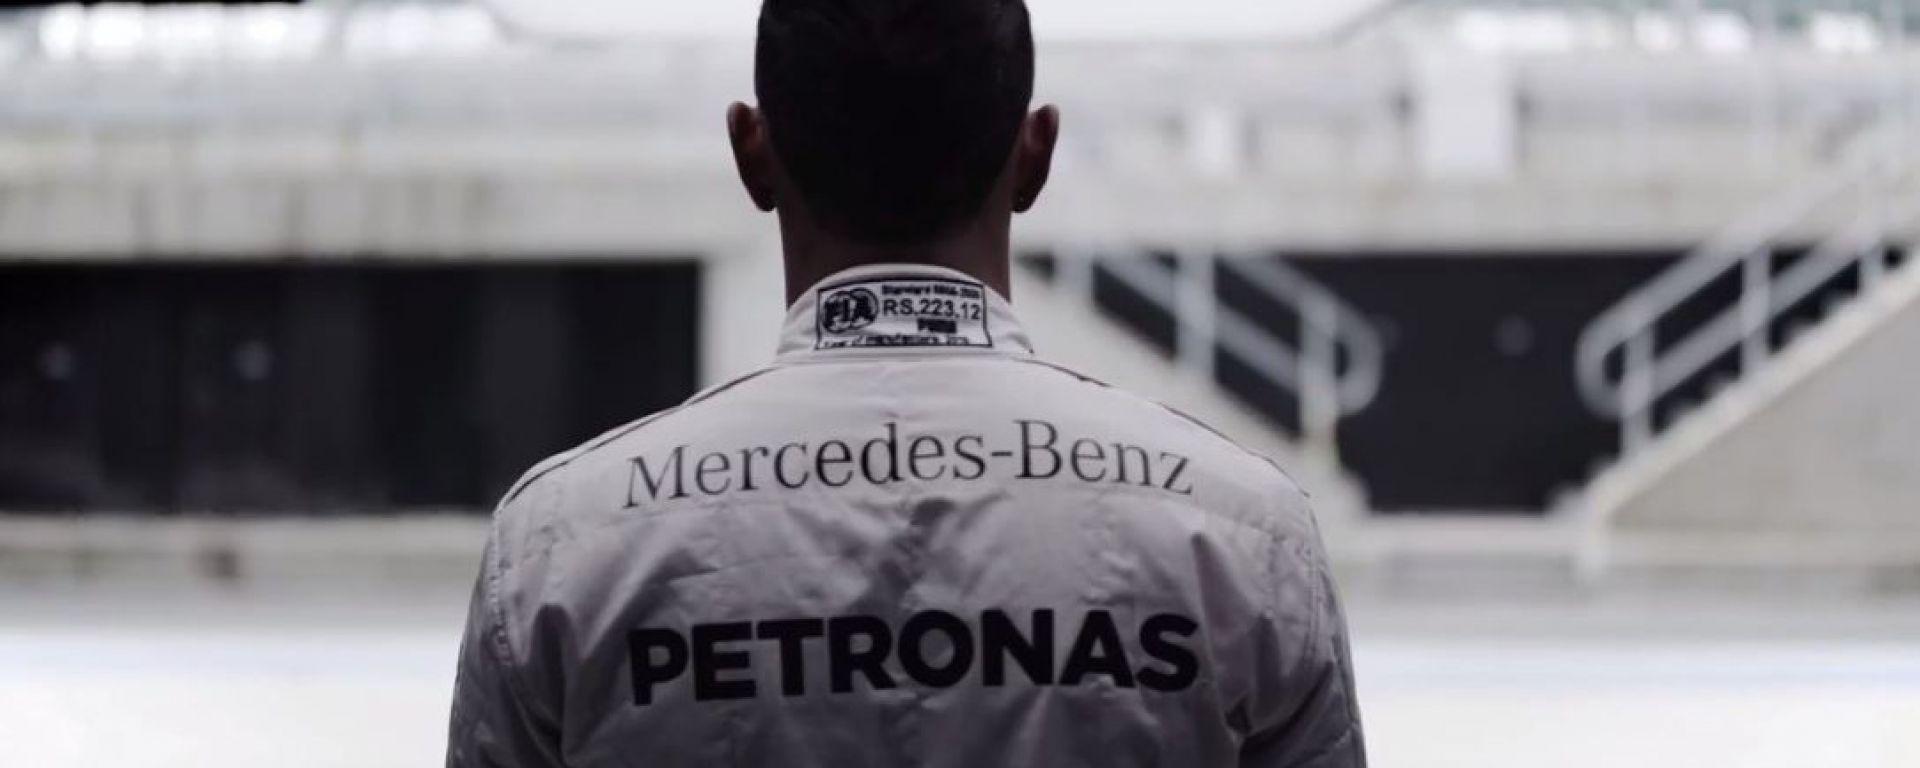 Mercedes GLE Coupé, così la guida Hamilton